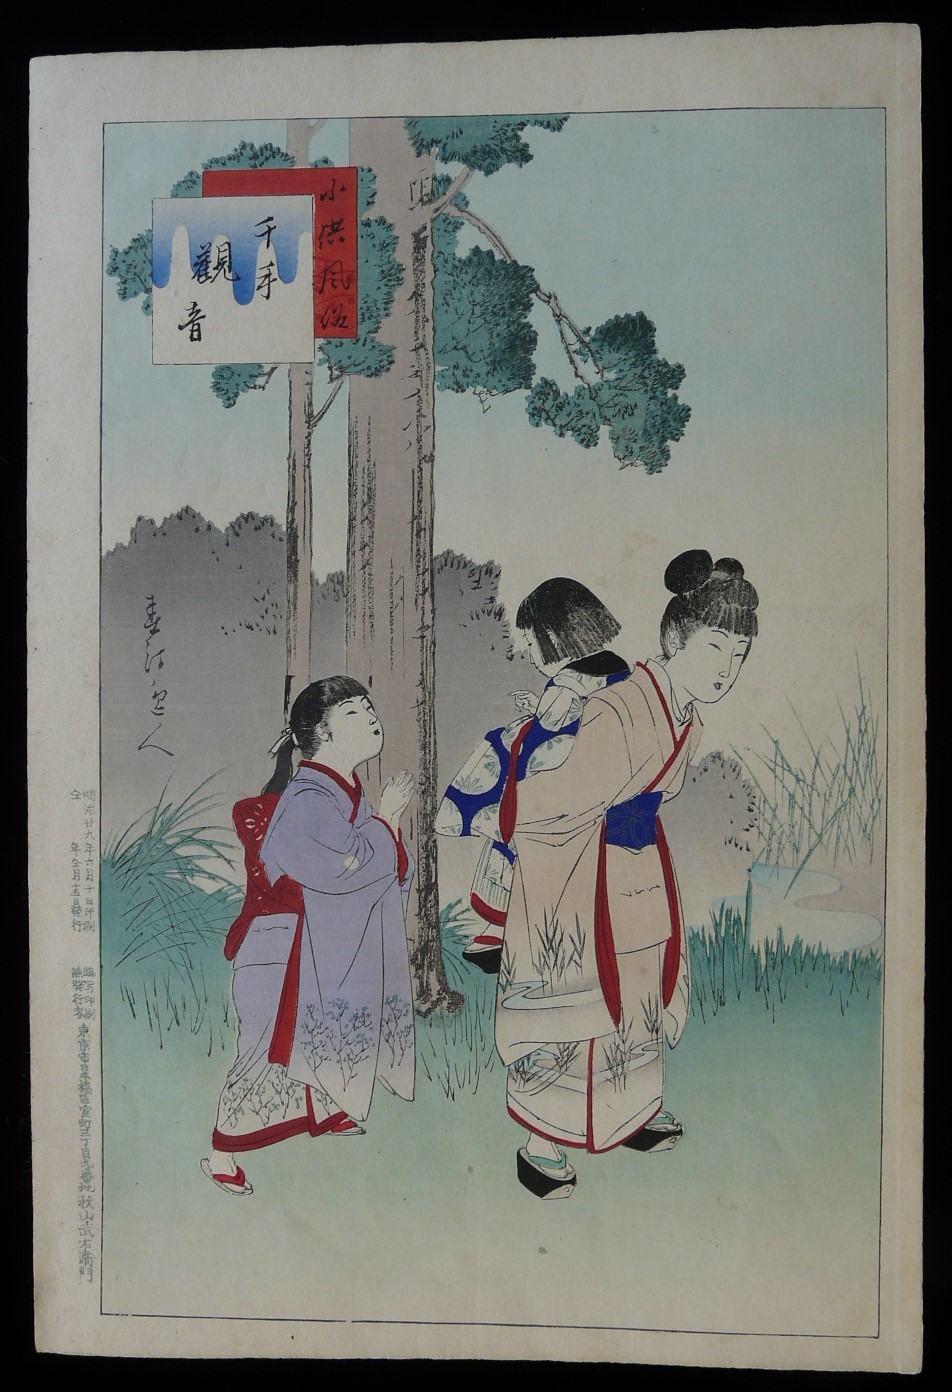 MIYAGAWA SHUNTEI: #P2300 FROM THE SERIES KODOMO FUZOKU - CHILDREN'S REFINEMENTS (1896)